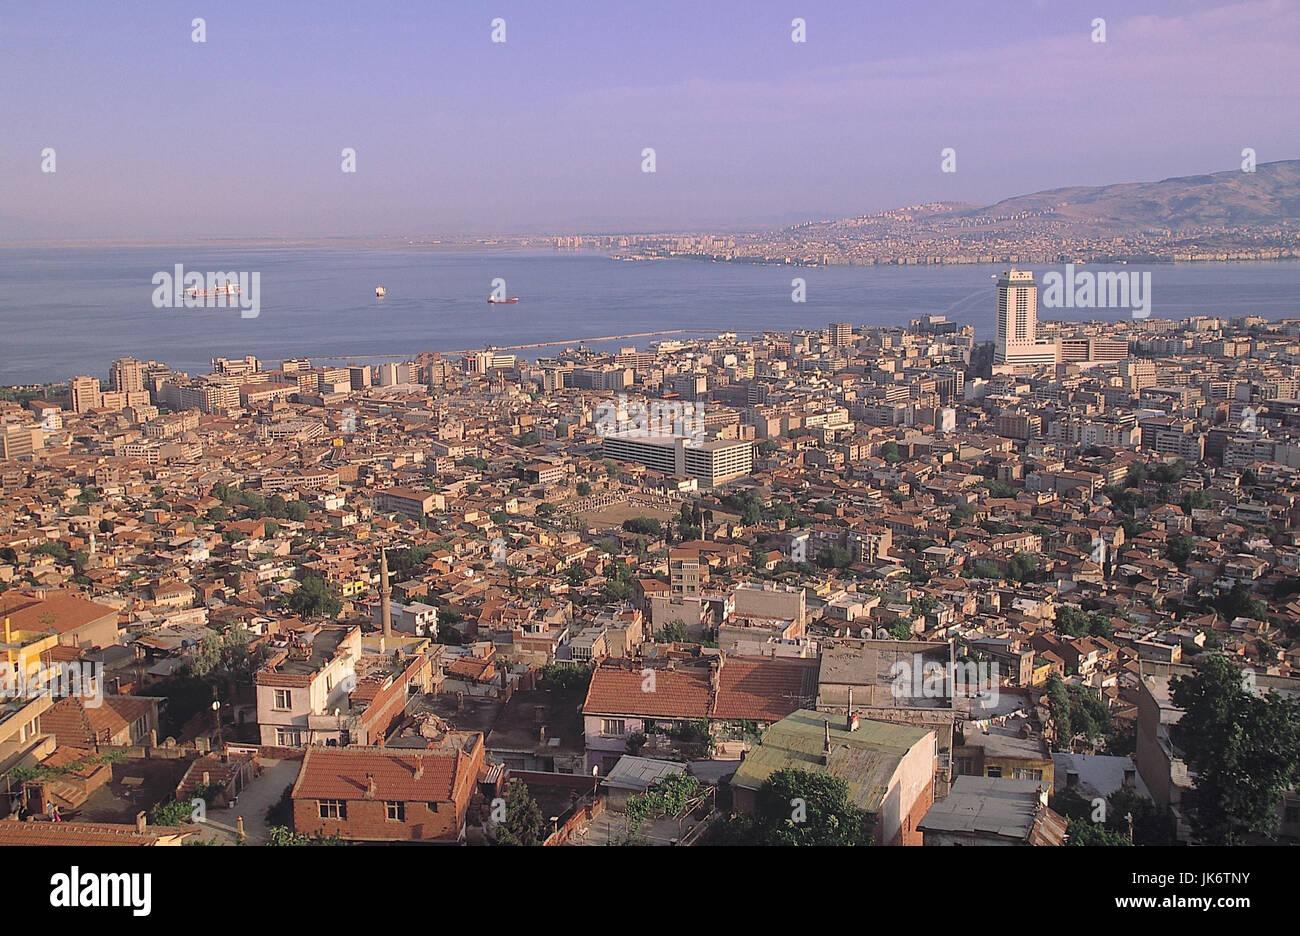 Türkei, Izmir, Stadtübersicht, Meer   Ägäisches Meer, Westküste, Provinz Izmir, Smyrna, - Stock Image